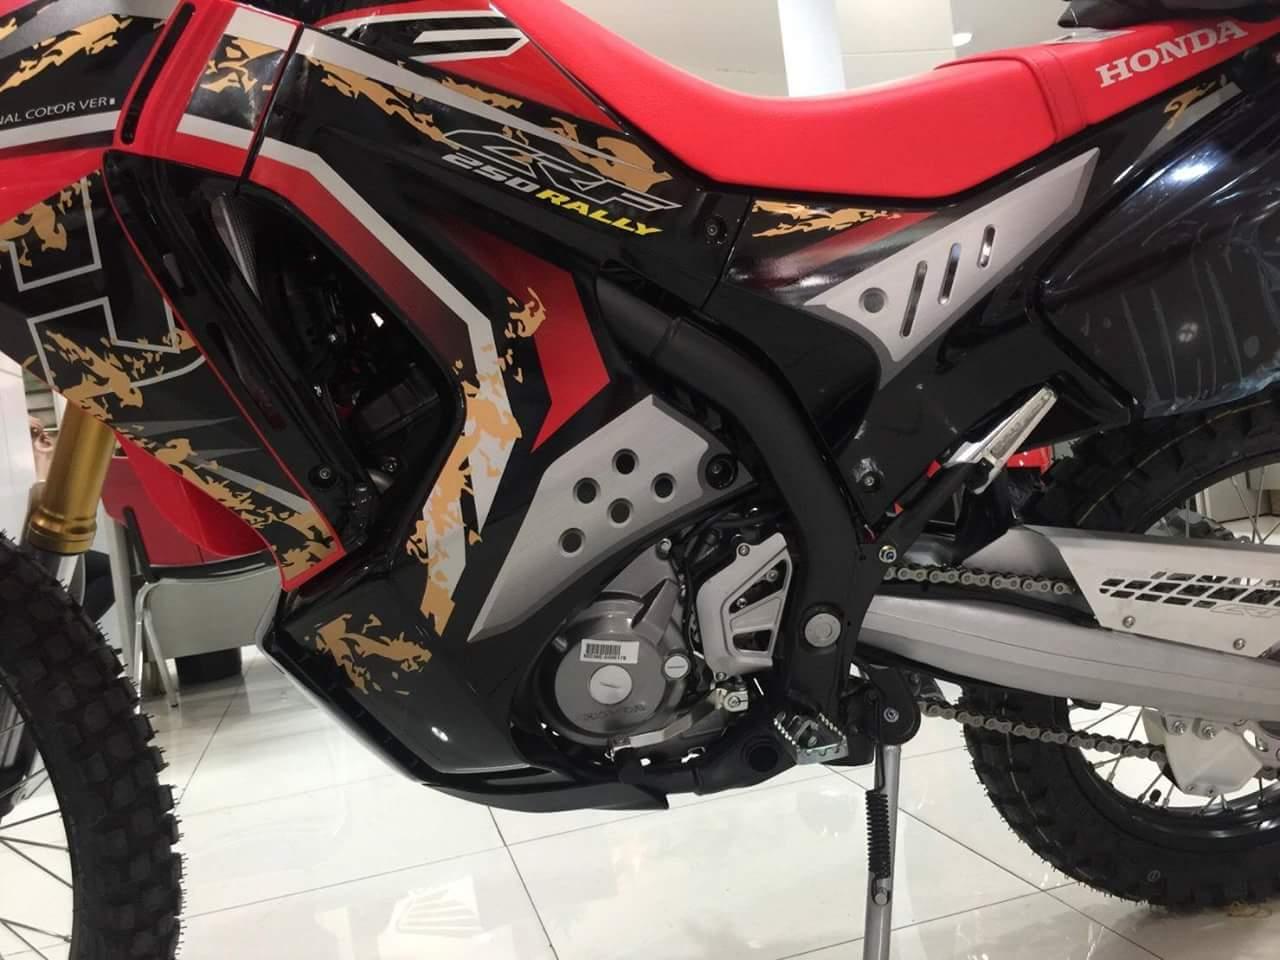 honda-crf250-rally-accessories-004